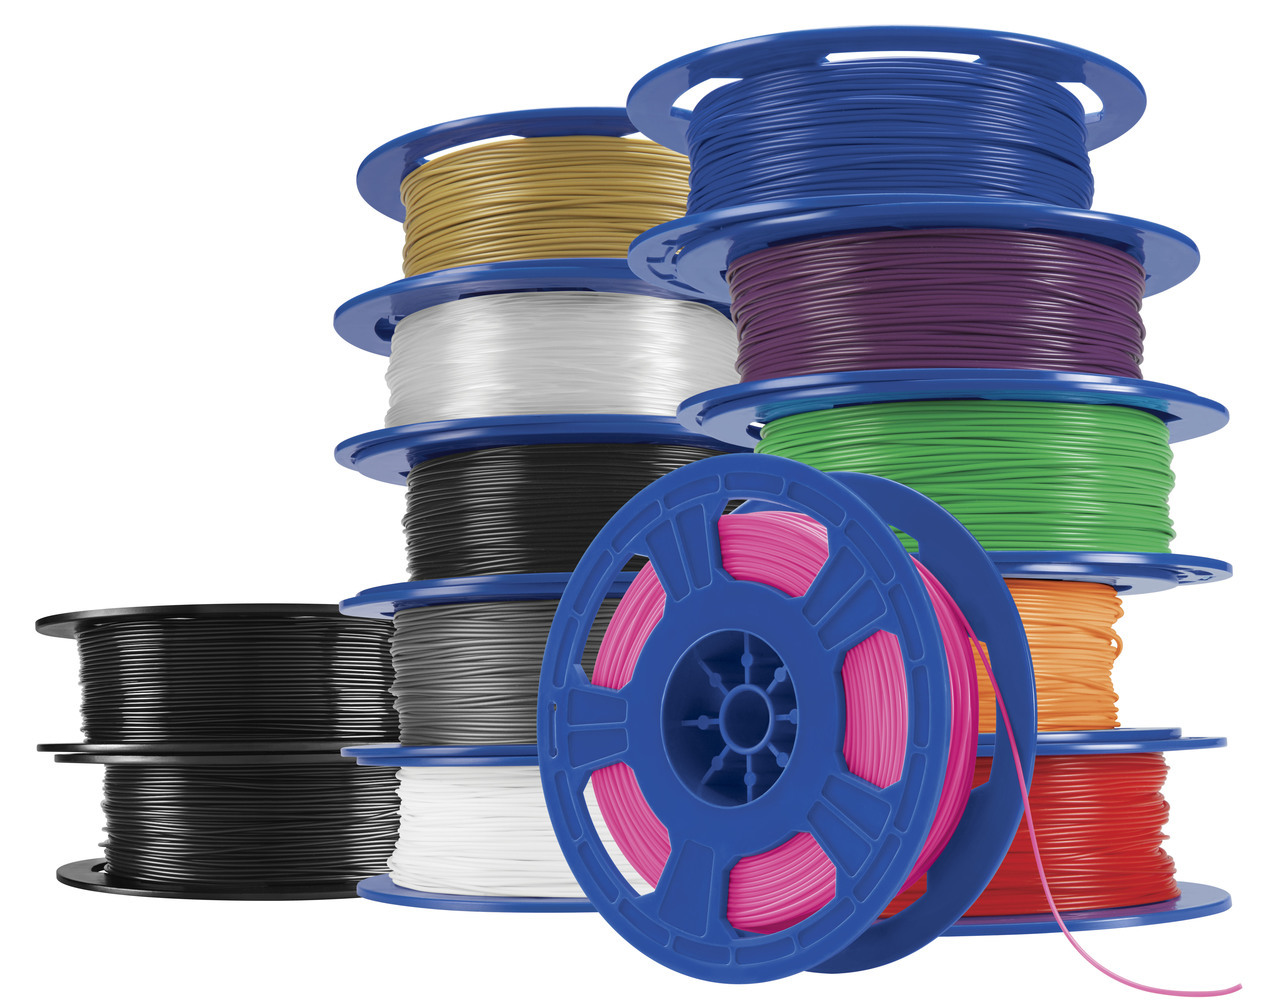 3Dプリンター用フィラメント市場が2025年に13億1027万ドル規模に成長